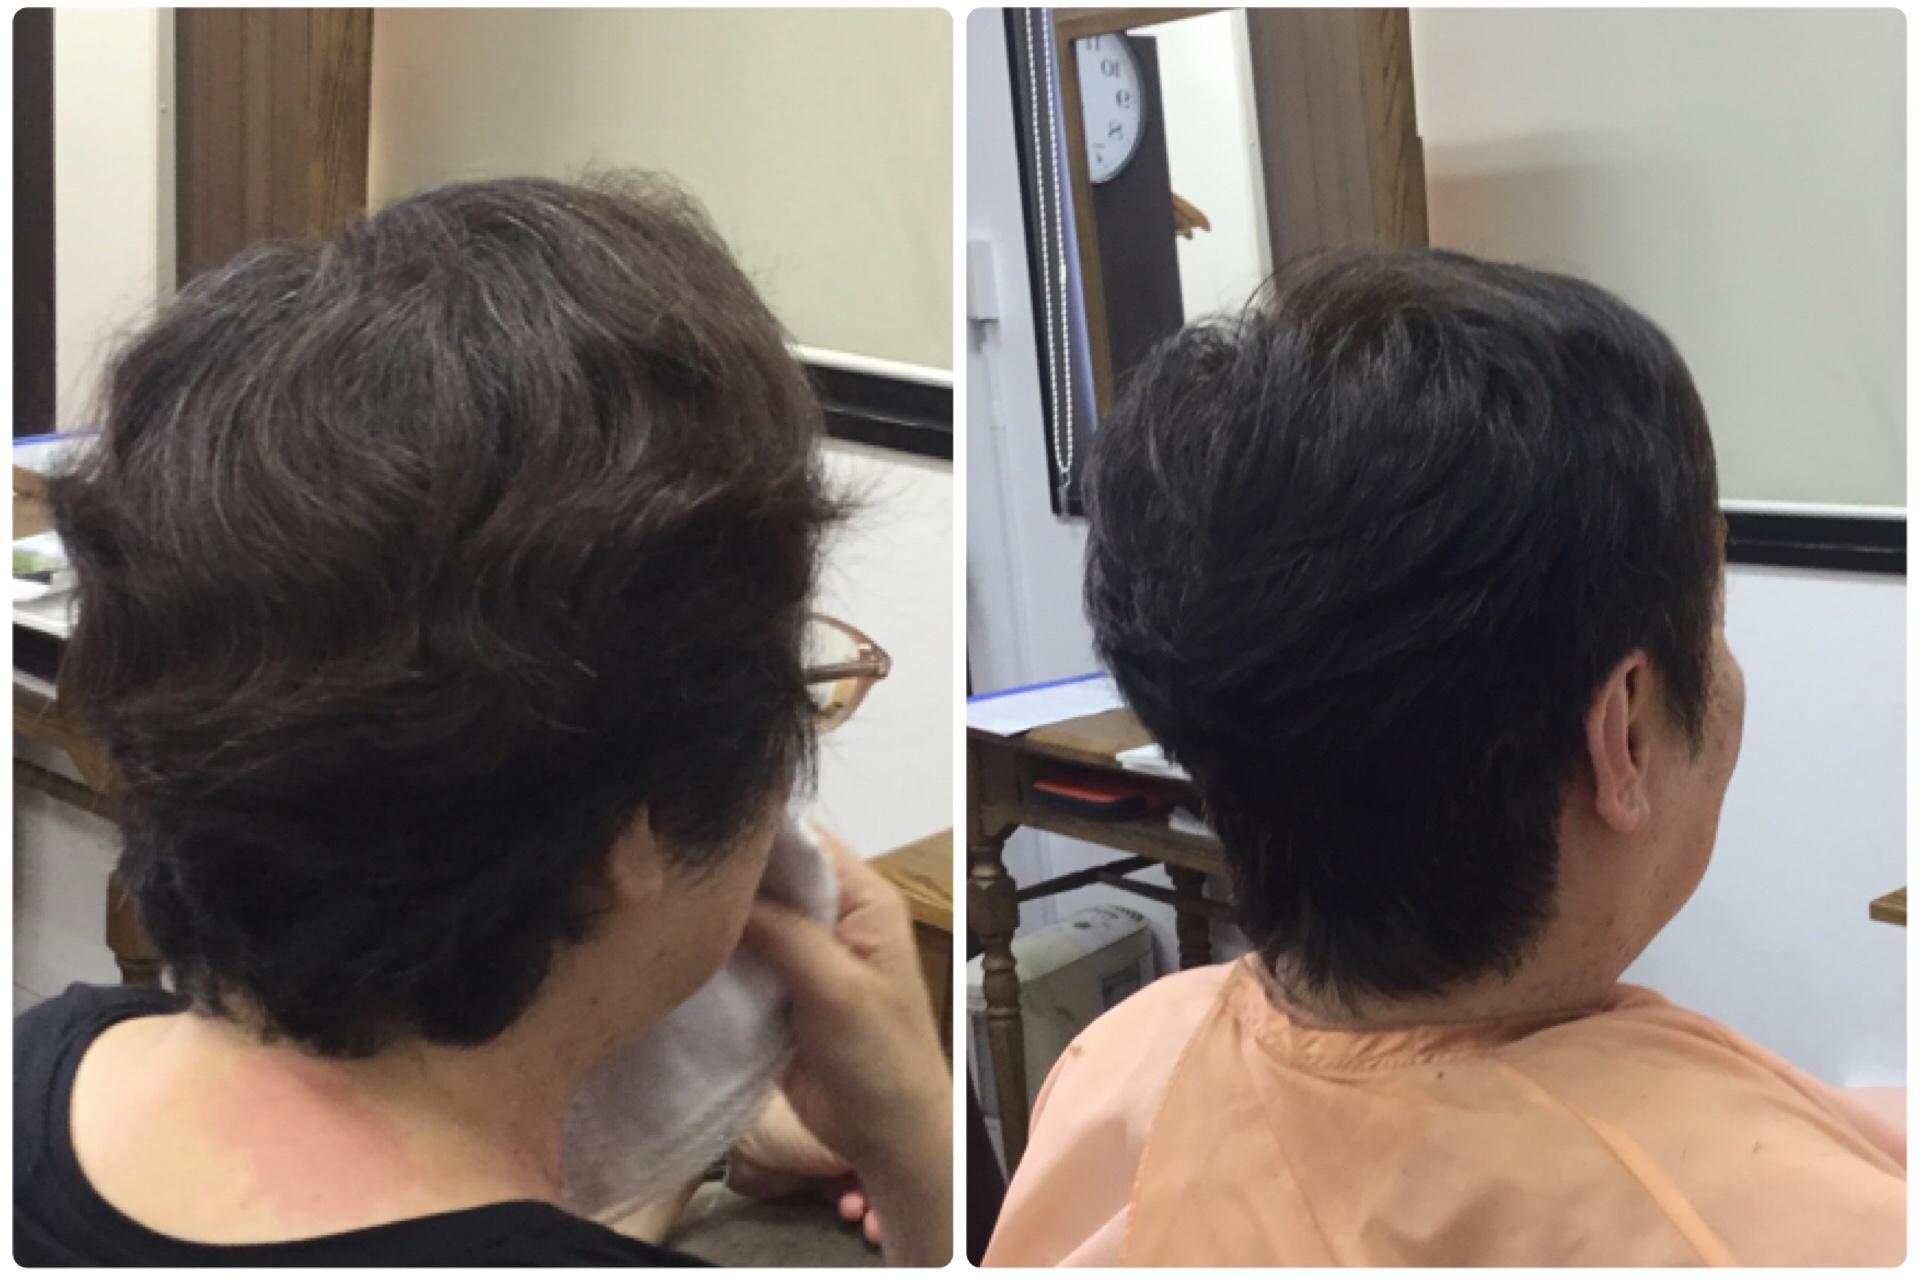 I50代くせ毛の悩みに【天然100%ヘナ+梳かないくせ毛カット】大人女性のための神戸くせ毛専門美容室アバディ